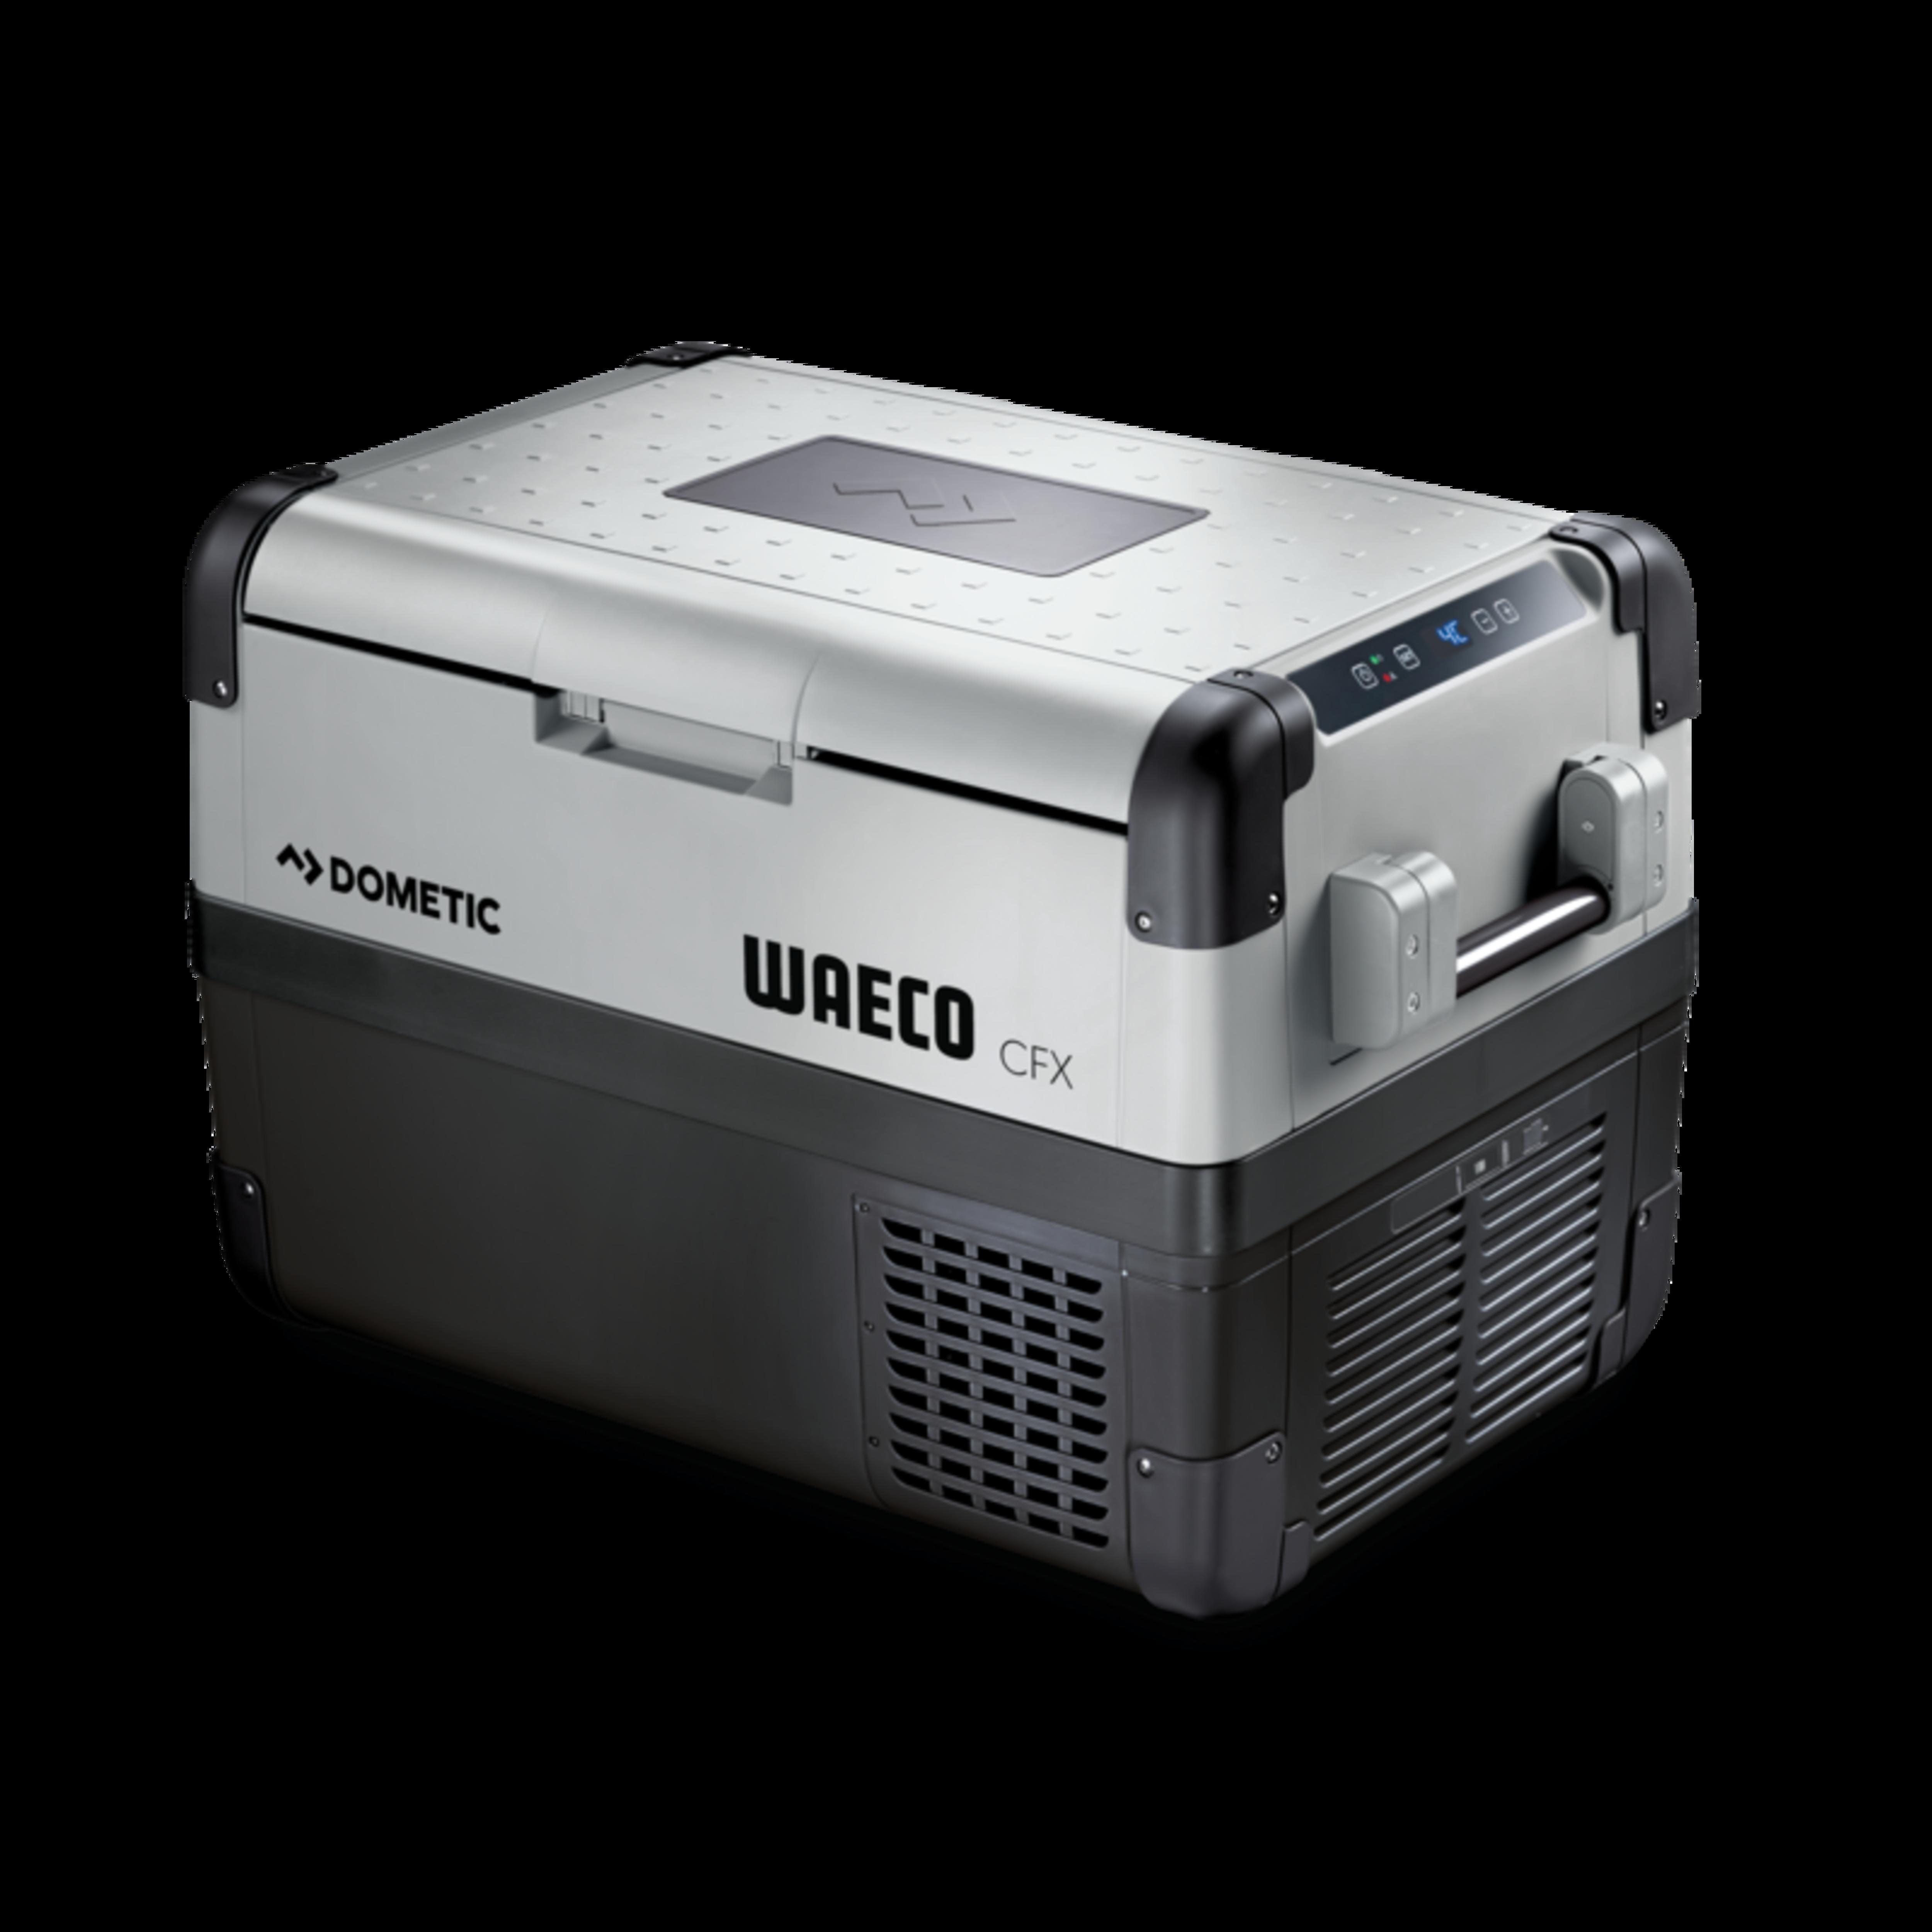 Dometic Waeco CFX 50W